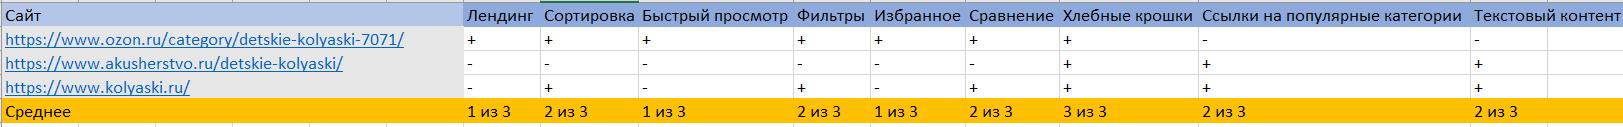 4c7d7a89ebf7cf4588f3b0b5656678dd.png